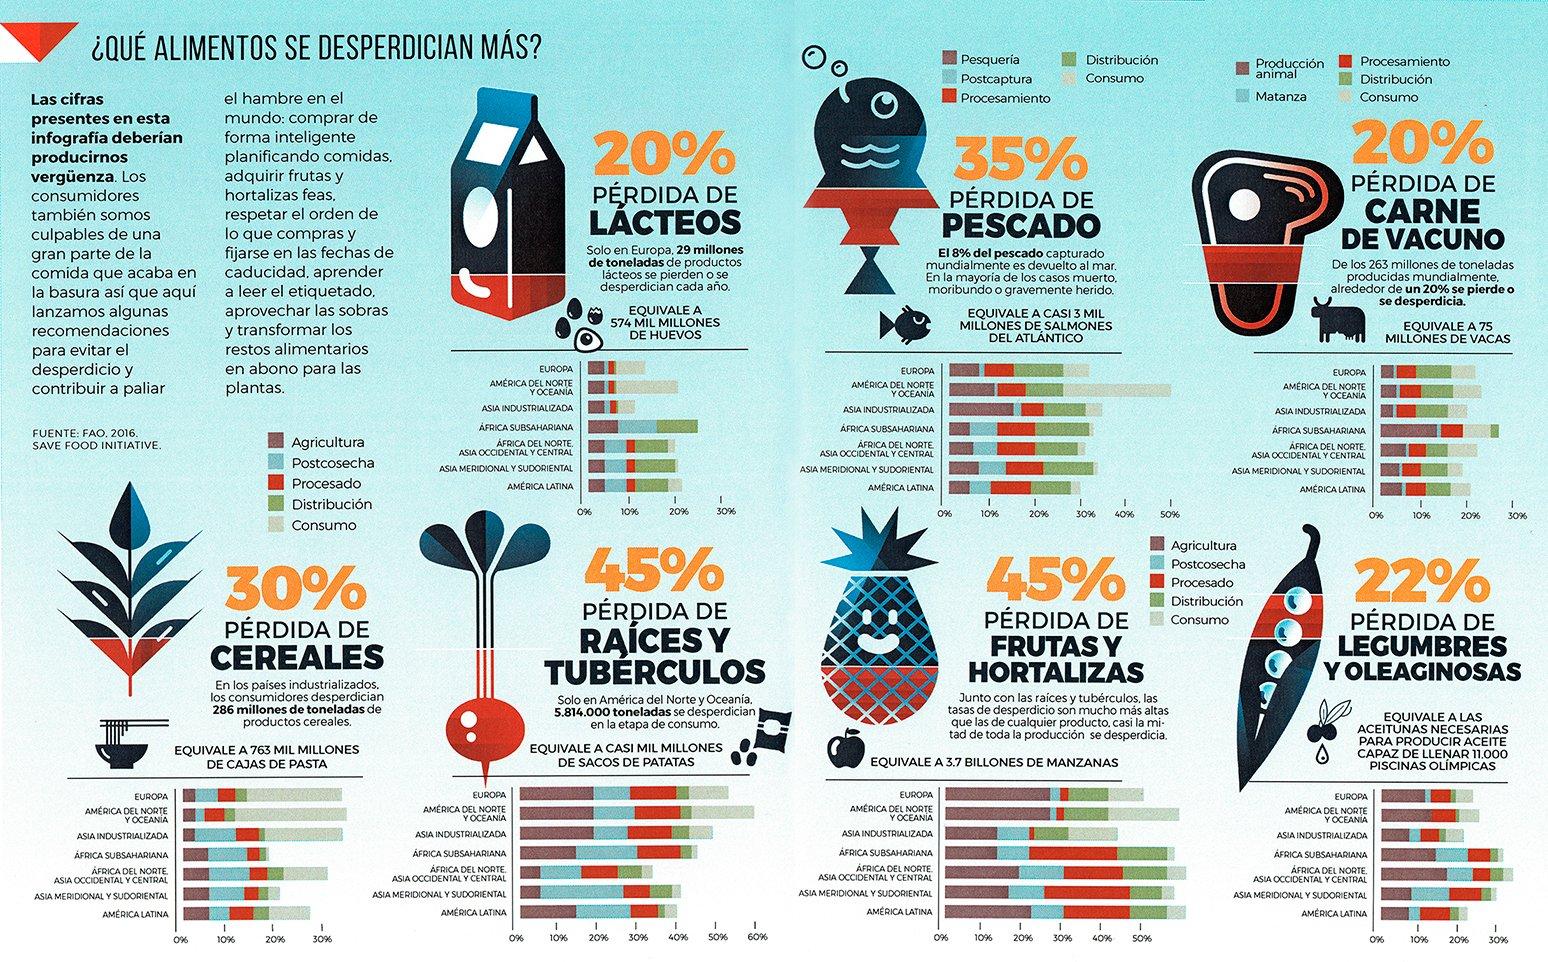 Desperdicio de Alimentos [Infografía] | ecogreenlove